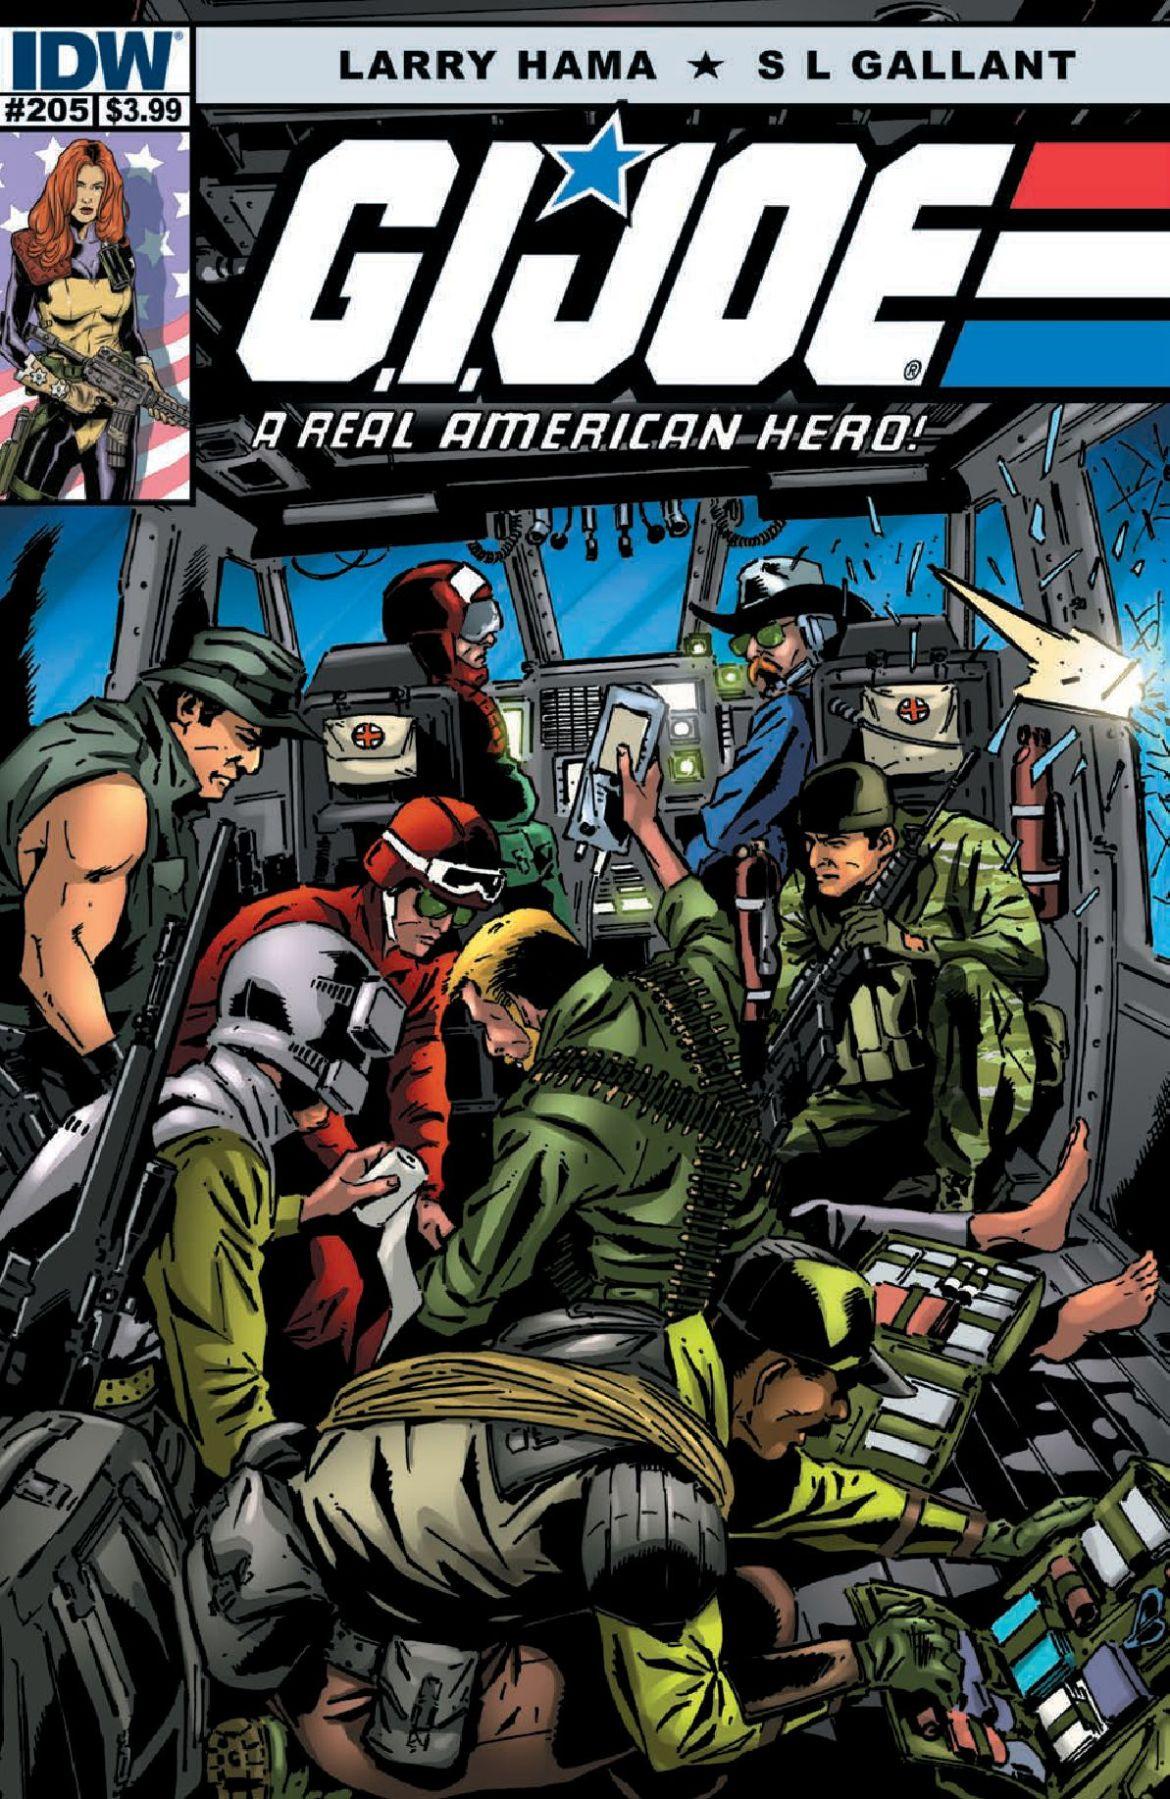 GI Joe A Real American Hero #205 Preview